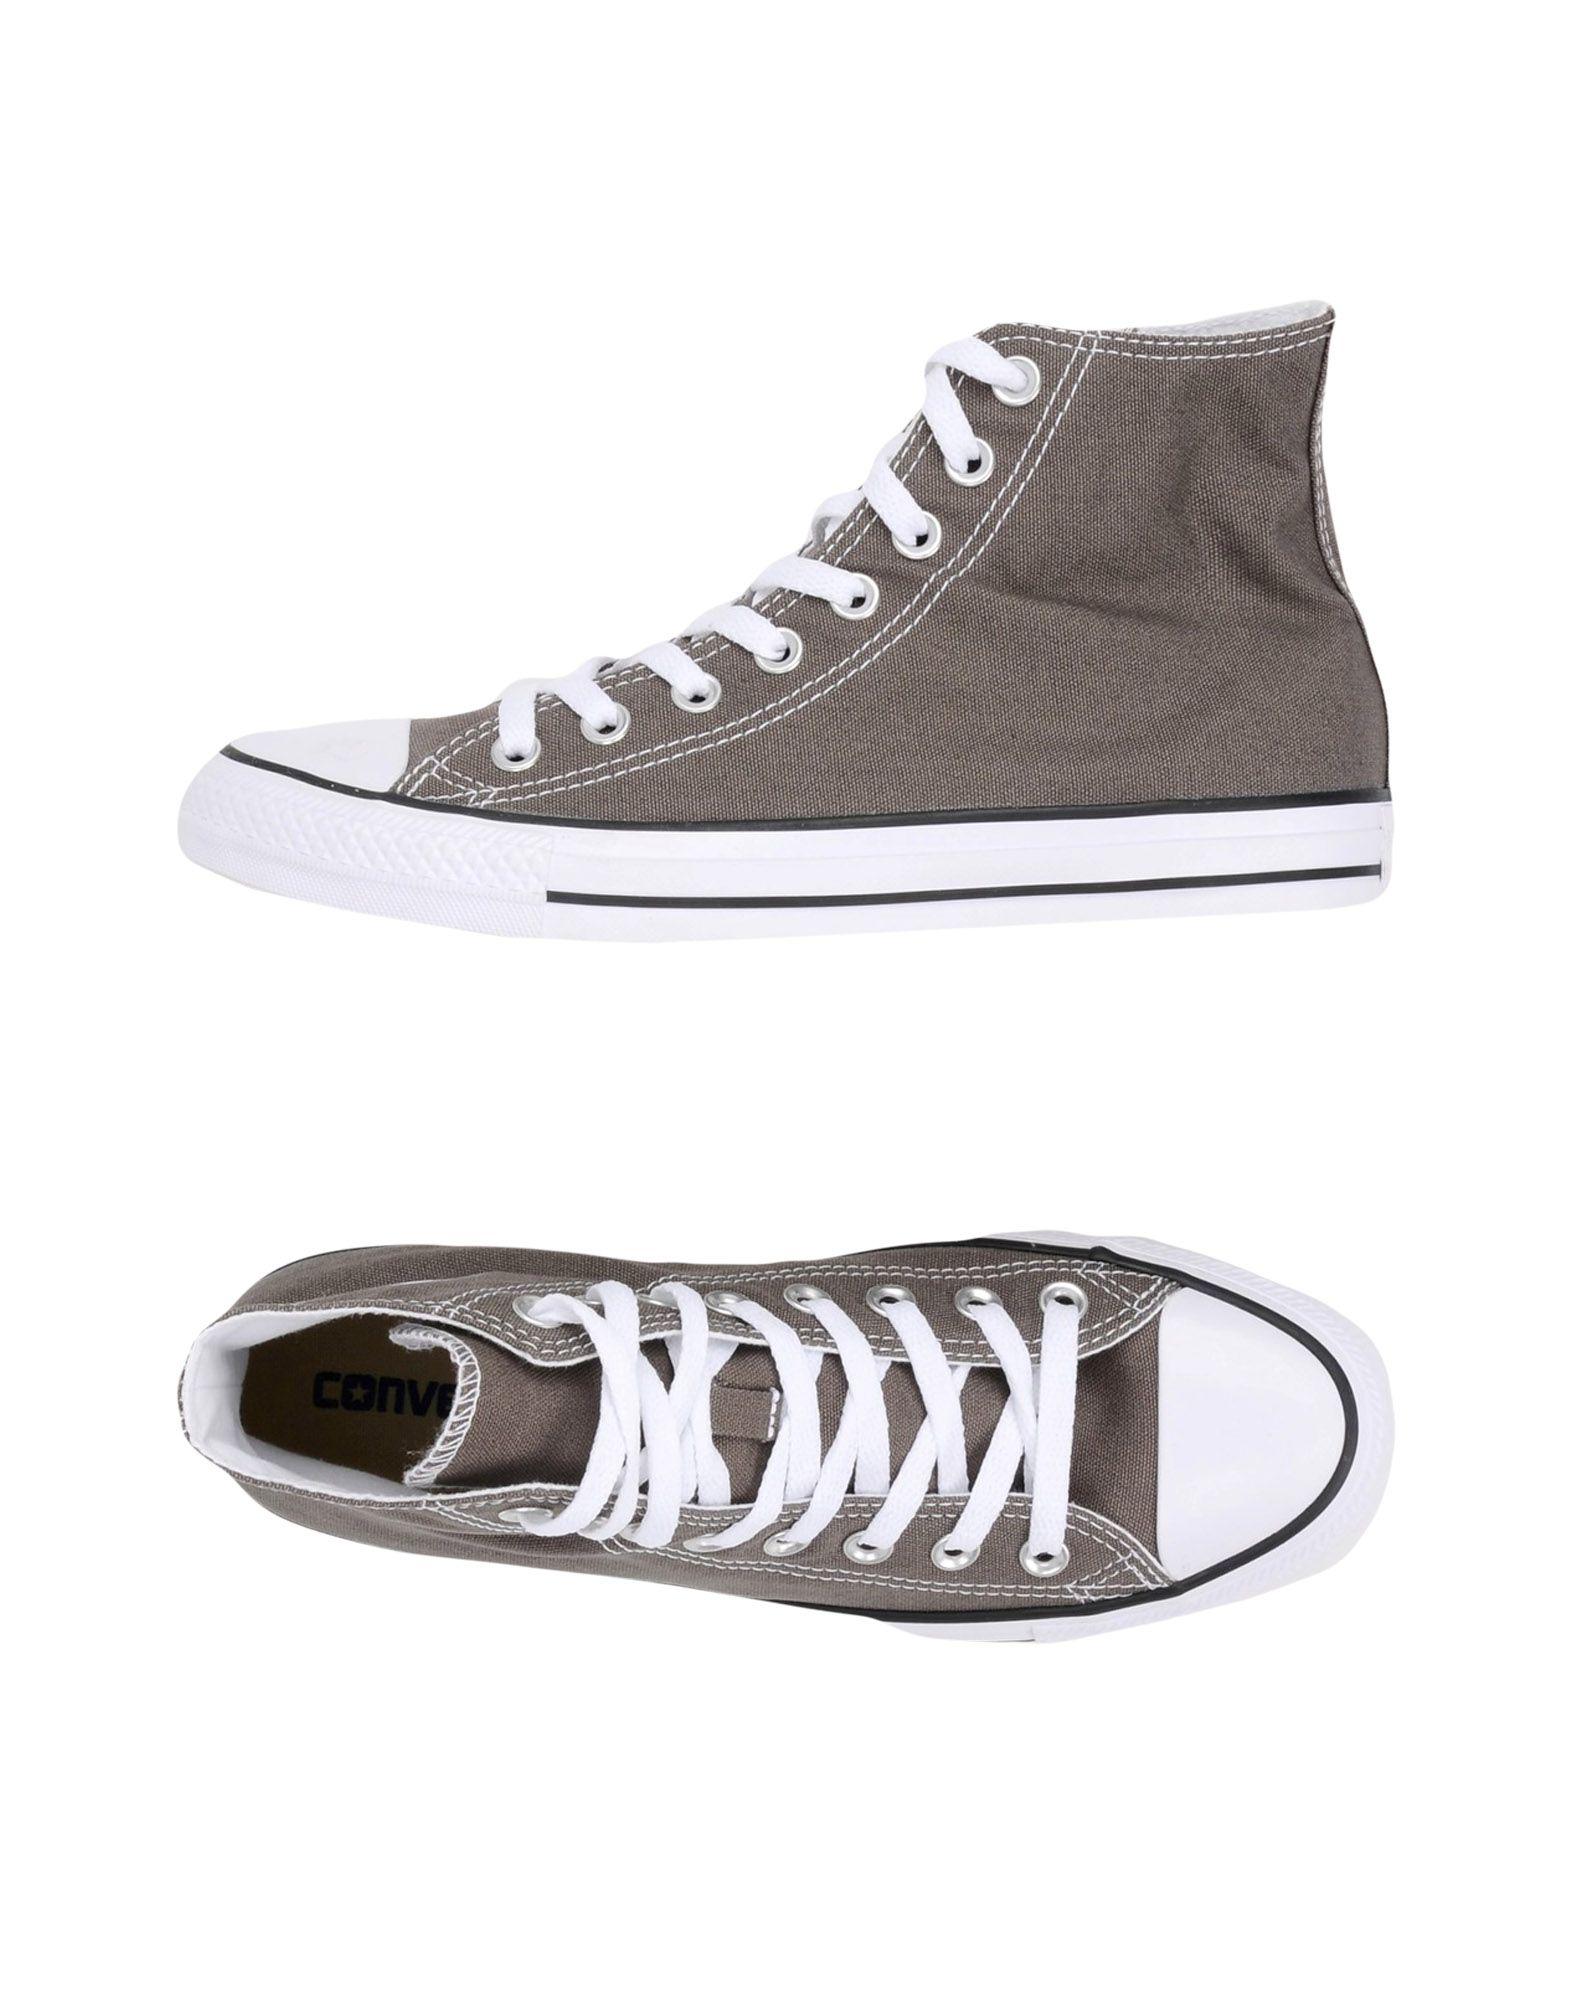 CONVERSE ALL STAR Herren High Sneakers & Tennisschuhe Farbe Grau Größe 6